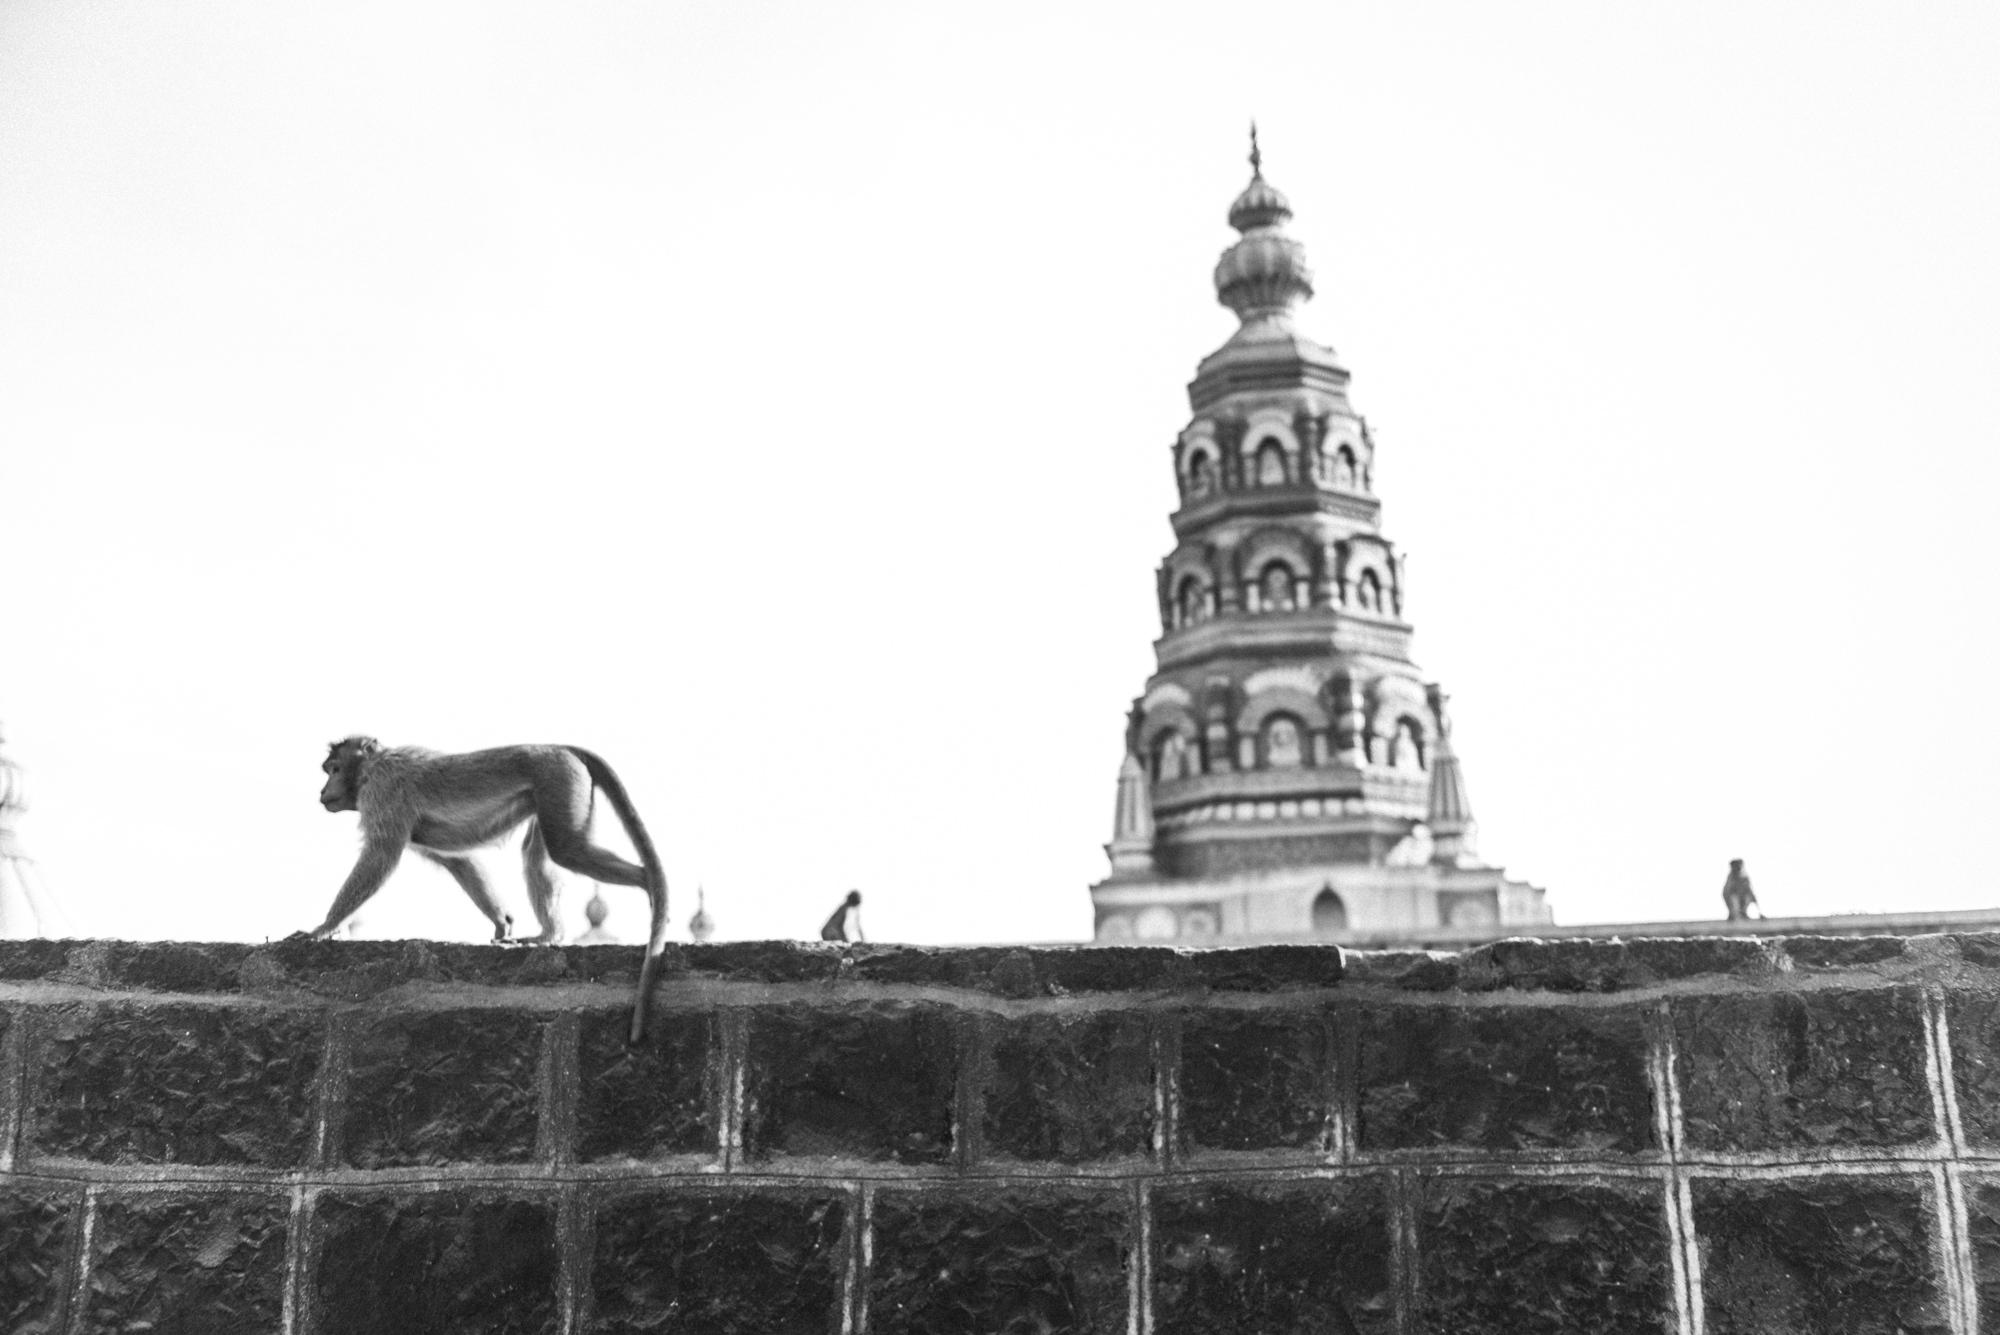 Affe im Shirsaidevi Mandir temple